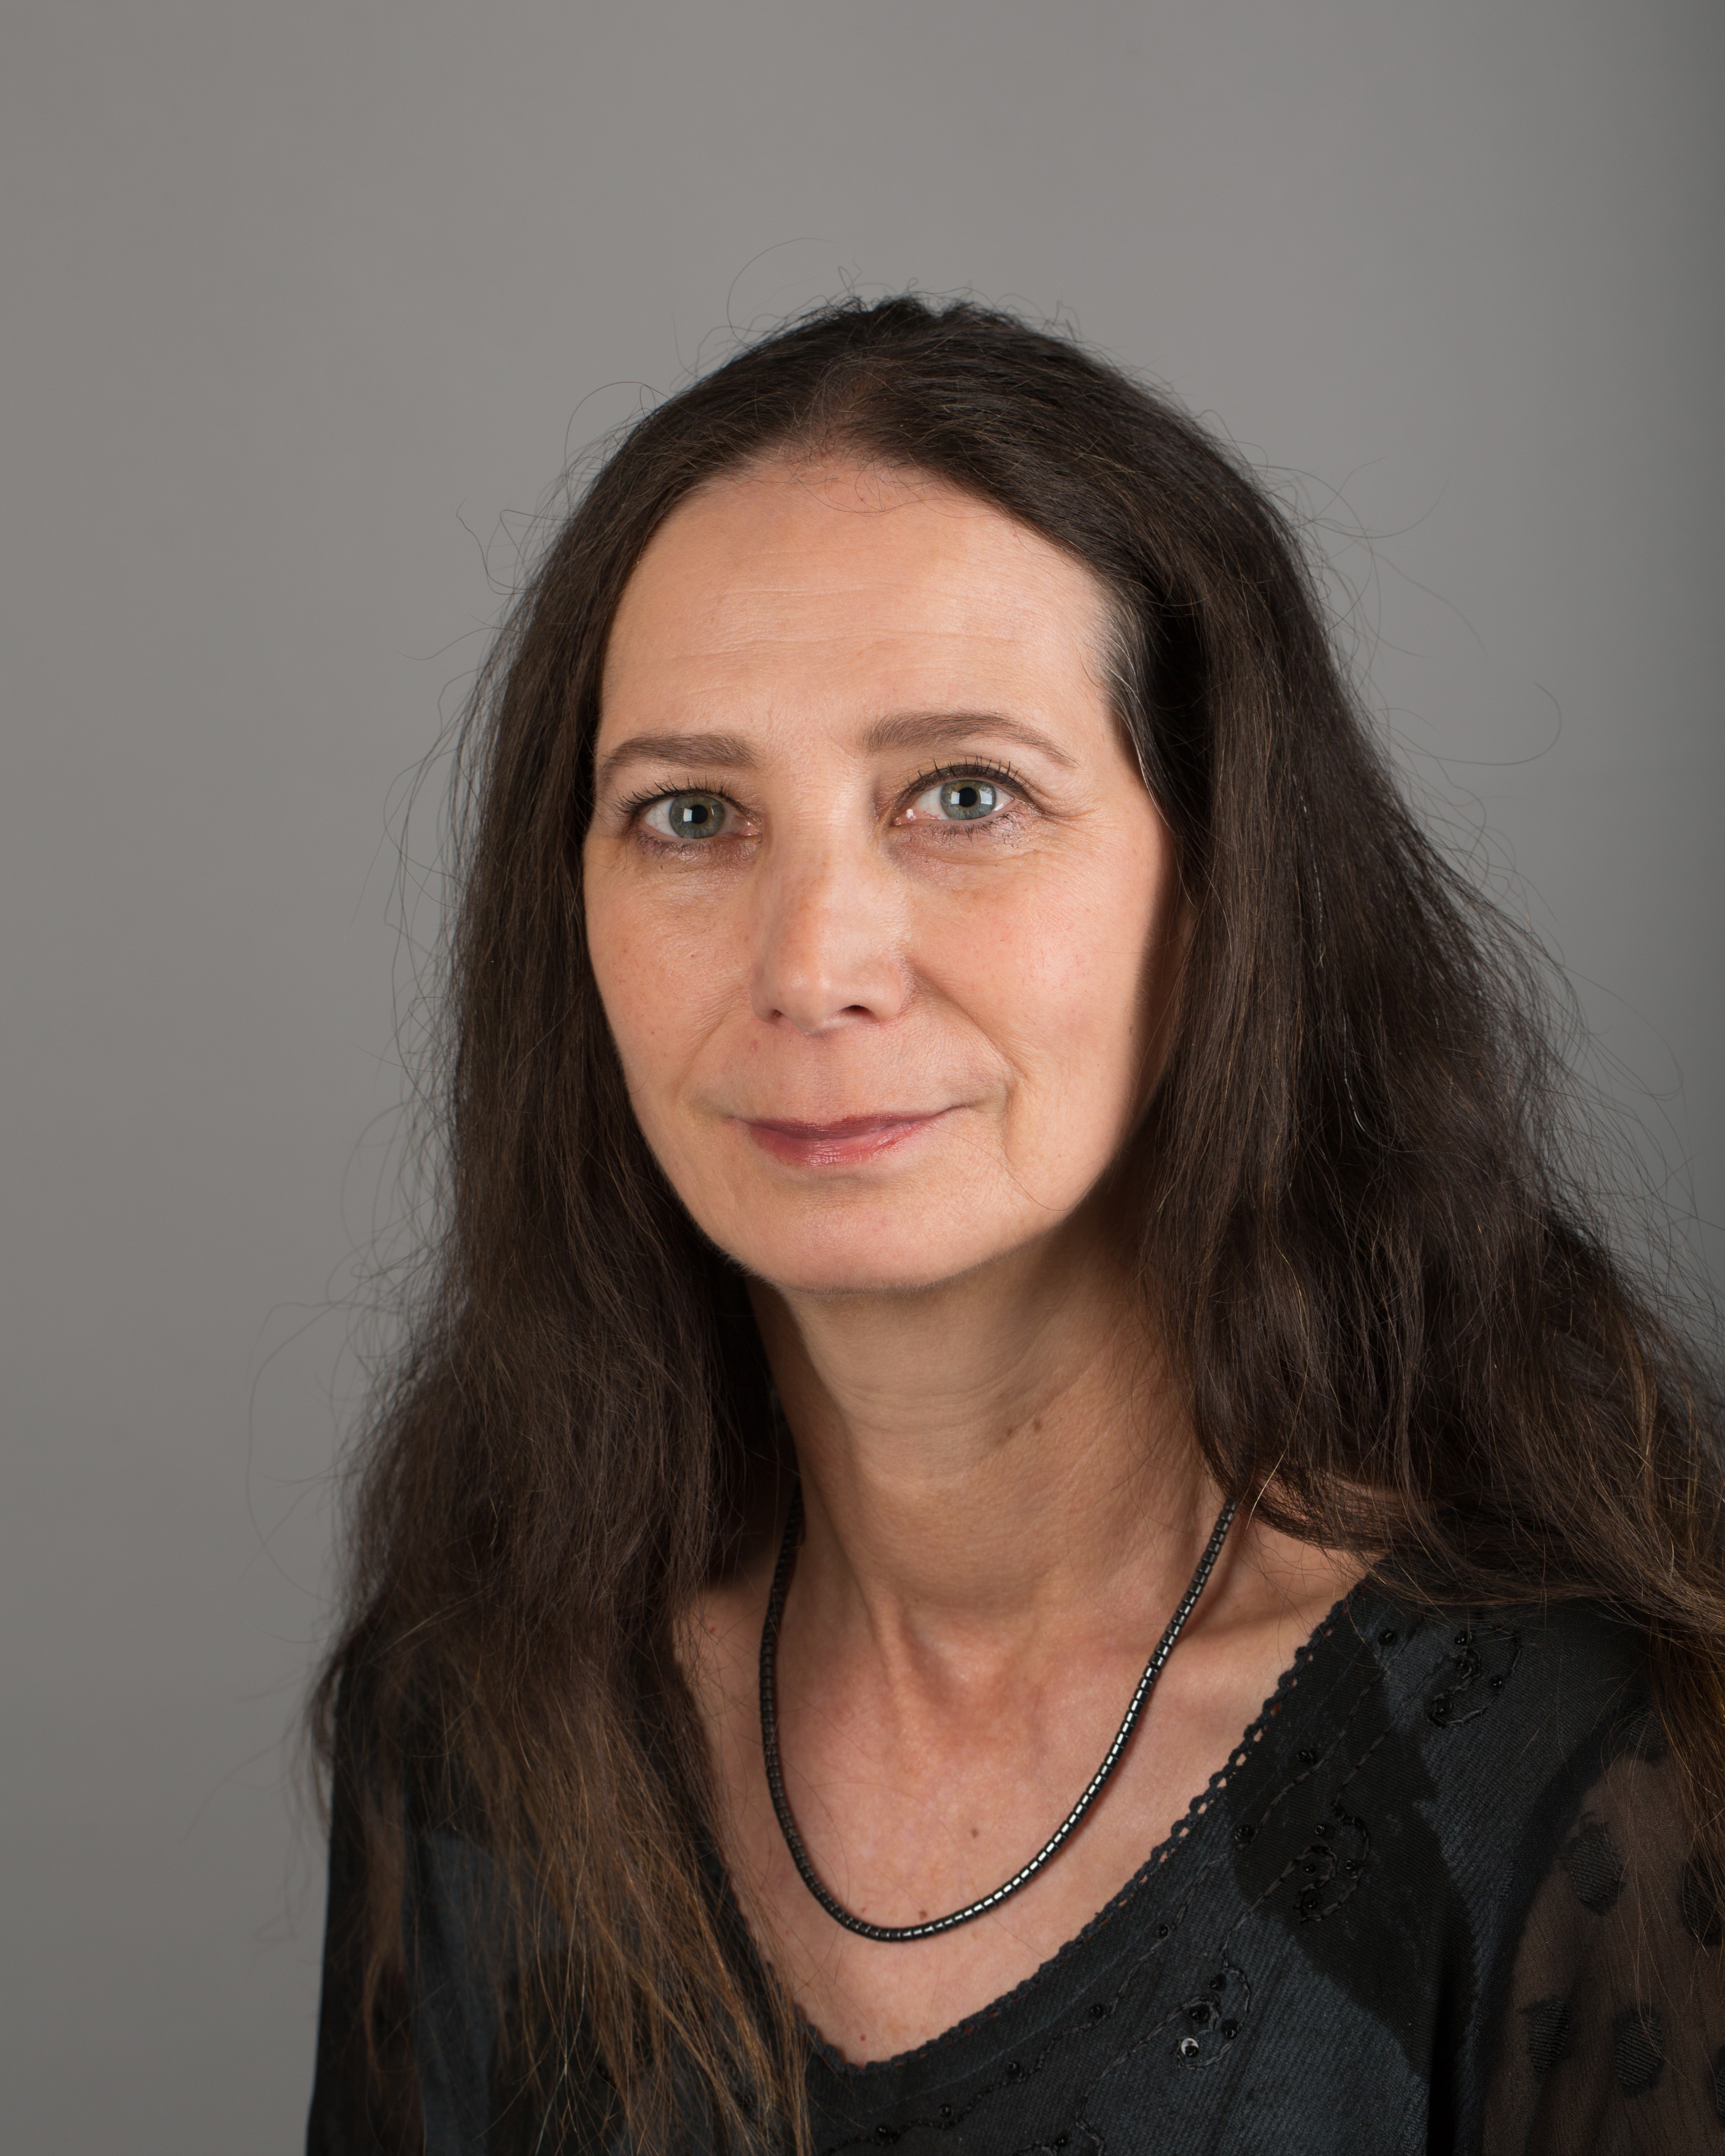 Elisabeth Zenger